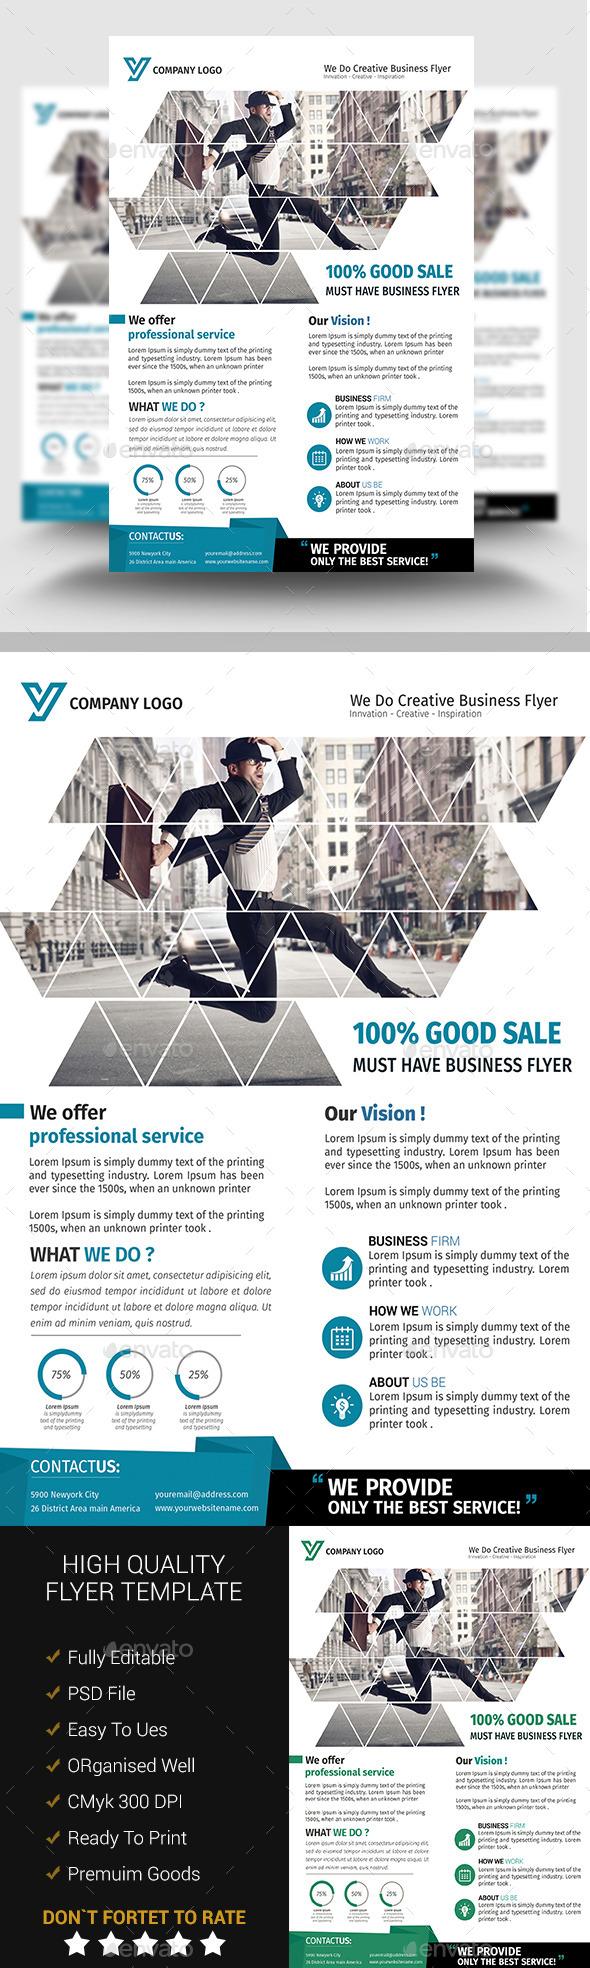 A4 Business Flyer Template 09